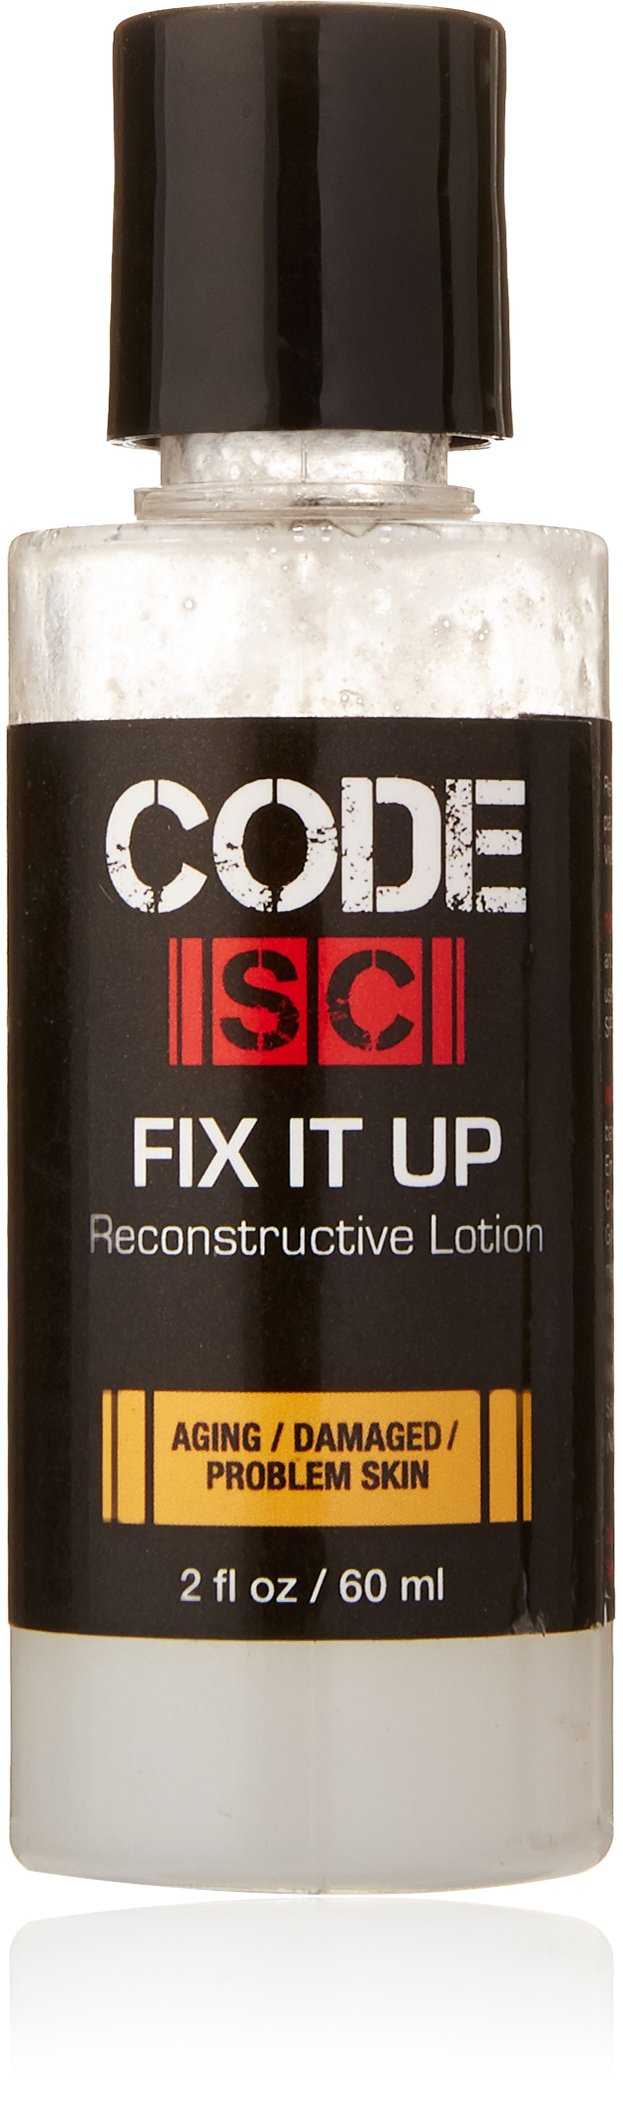 Code Sc Fix It Up Reconstructive Lotion, 2 Ounce